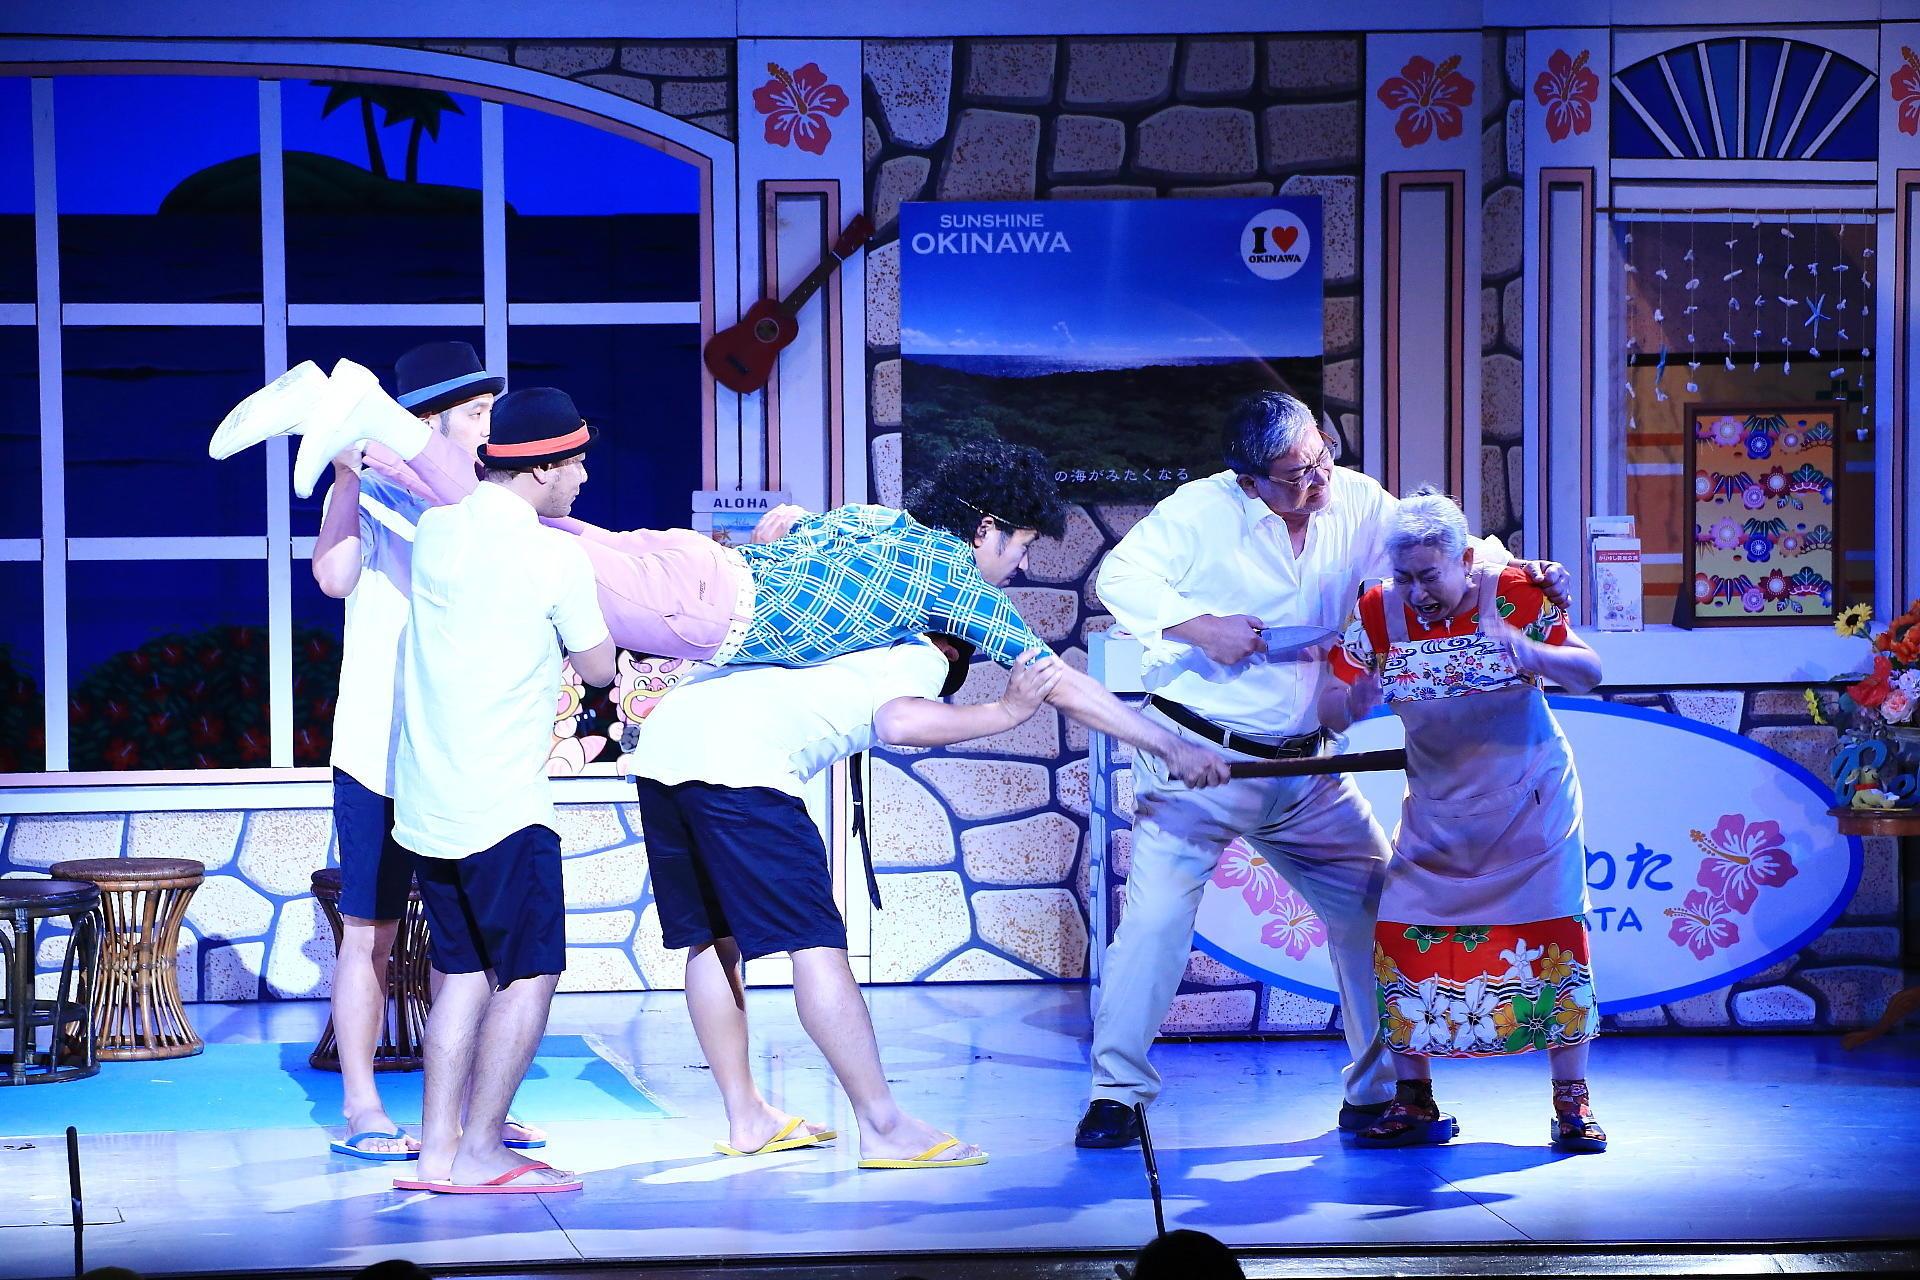 http://news.yoshimoto.co.jp/20180906110058-da8b54880f69187dd52383daf504eaddcfb63861.jpg